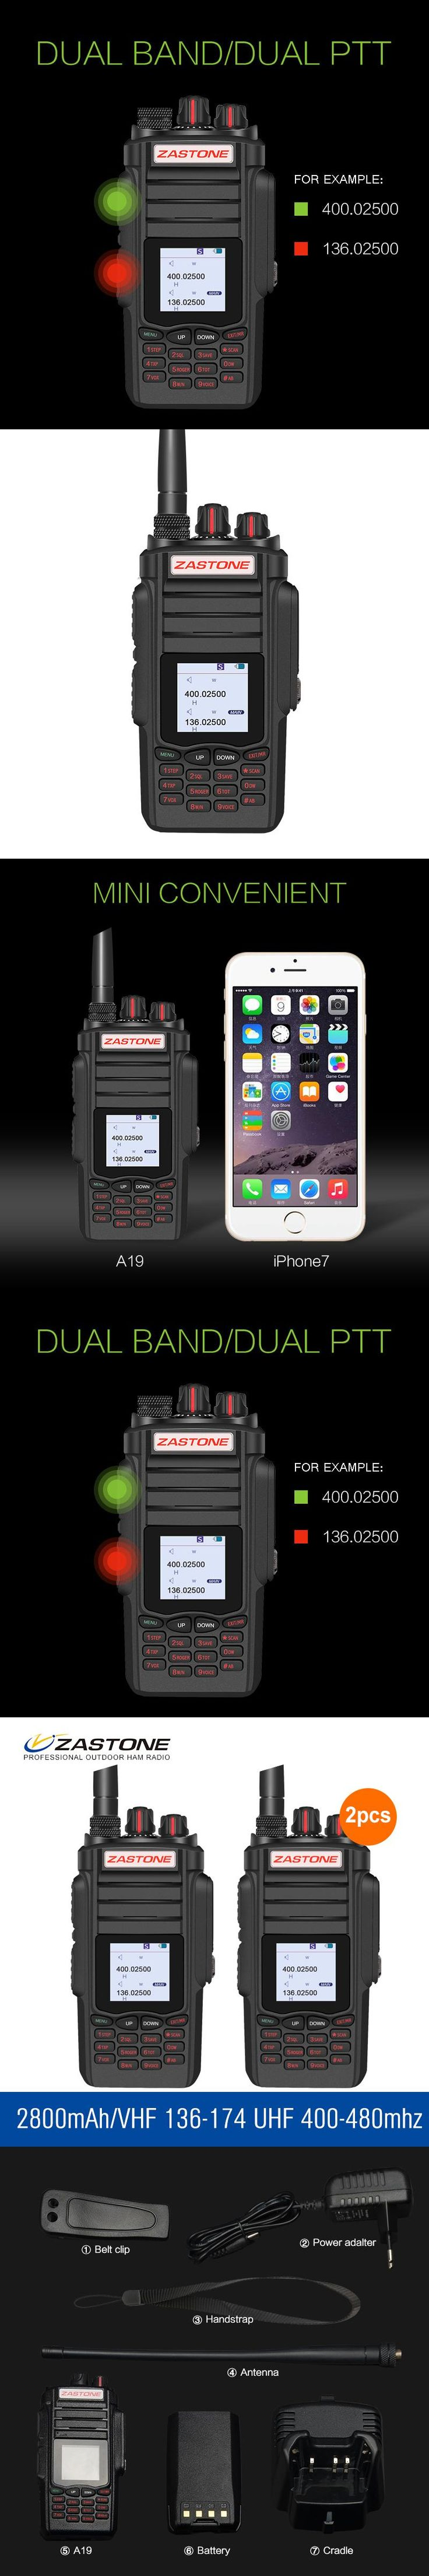 311 best communication equipments images on pinterest